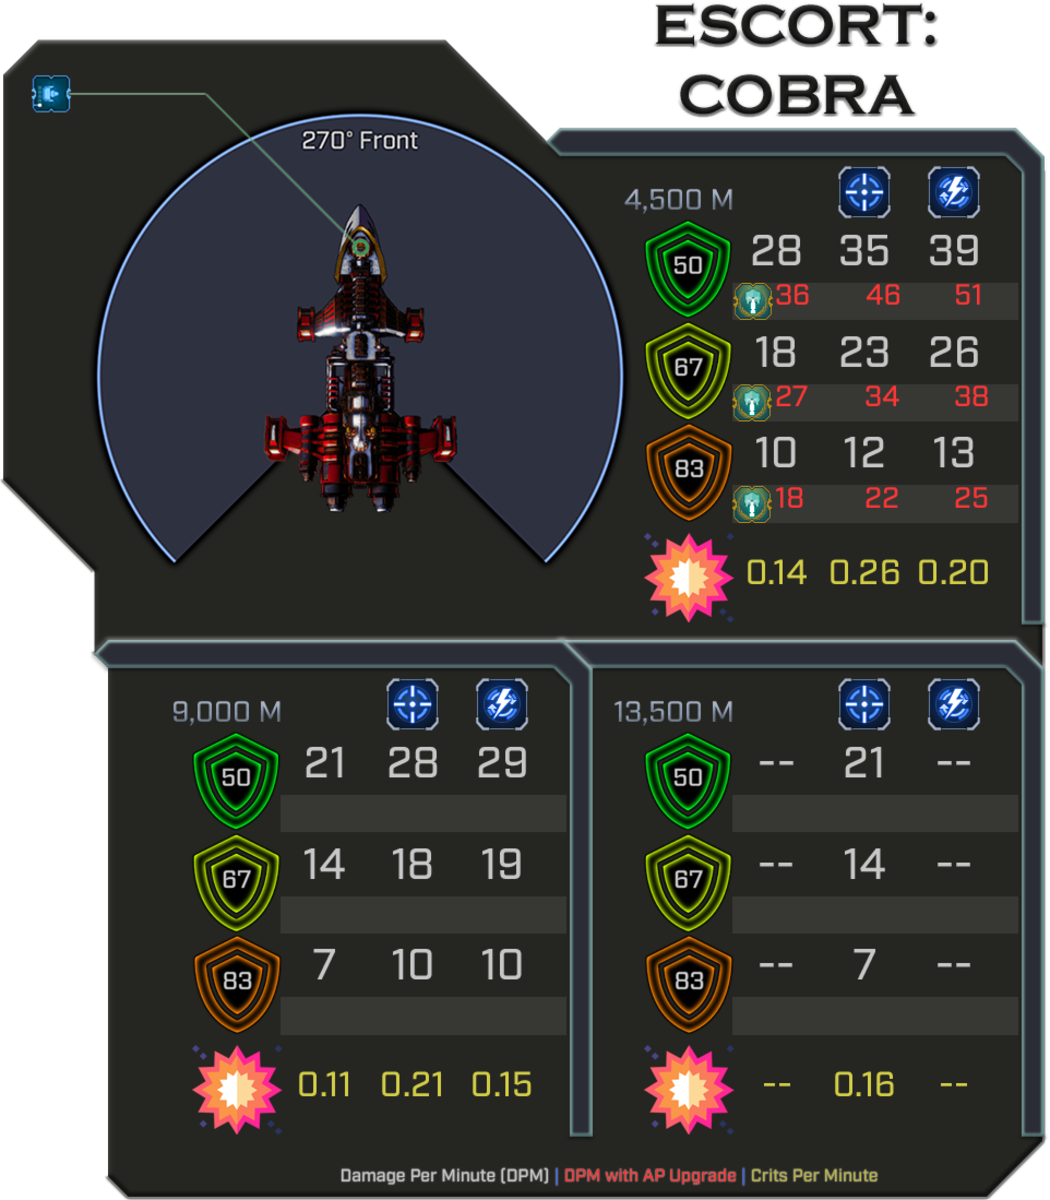 Ad-Mech Cobra - Weapon Damage Profile